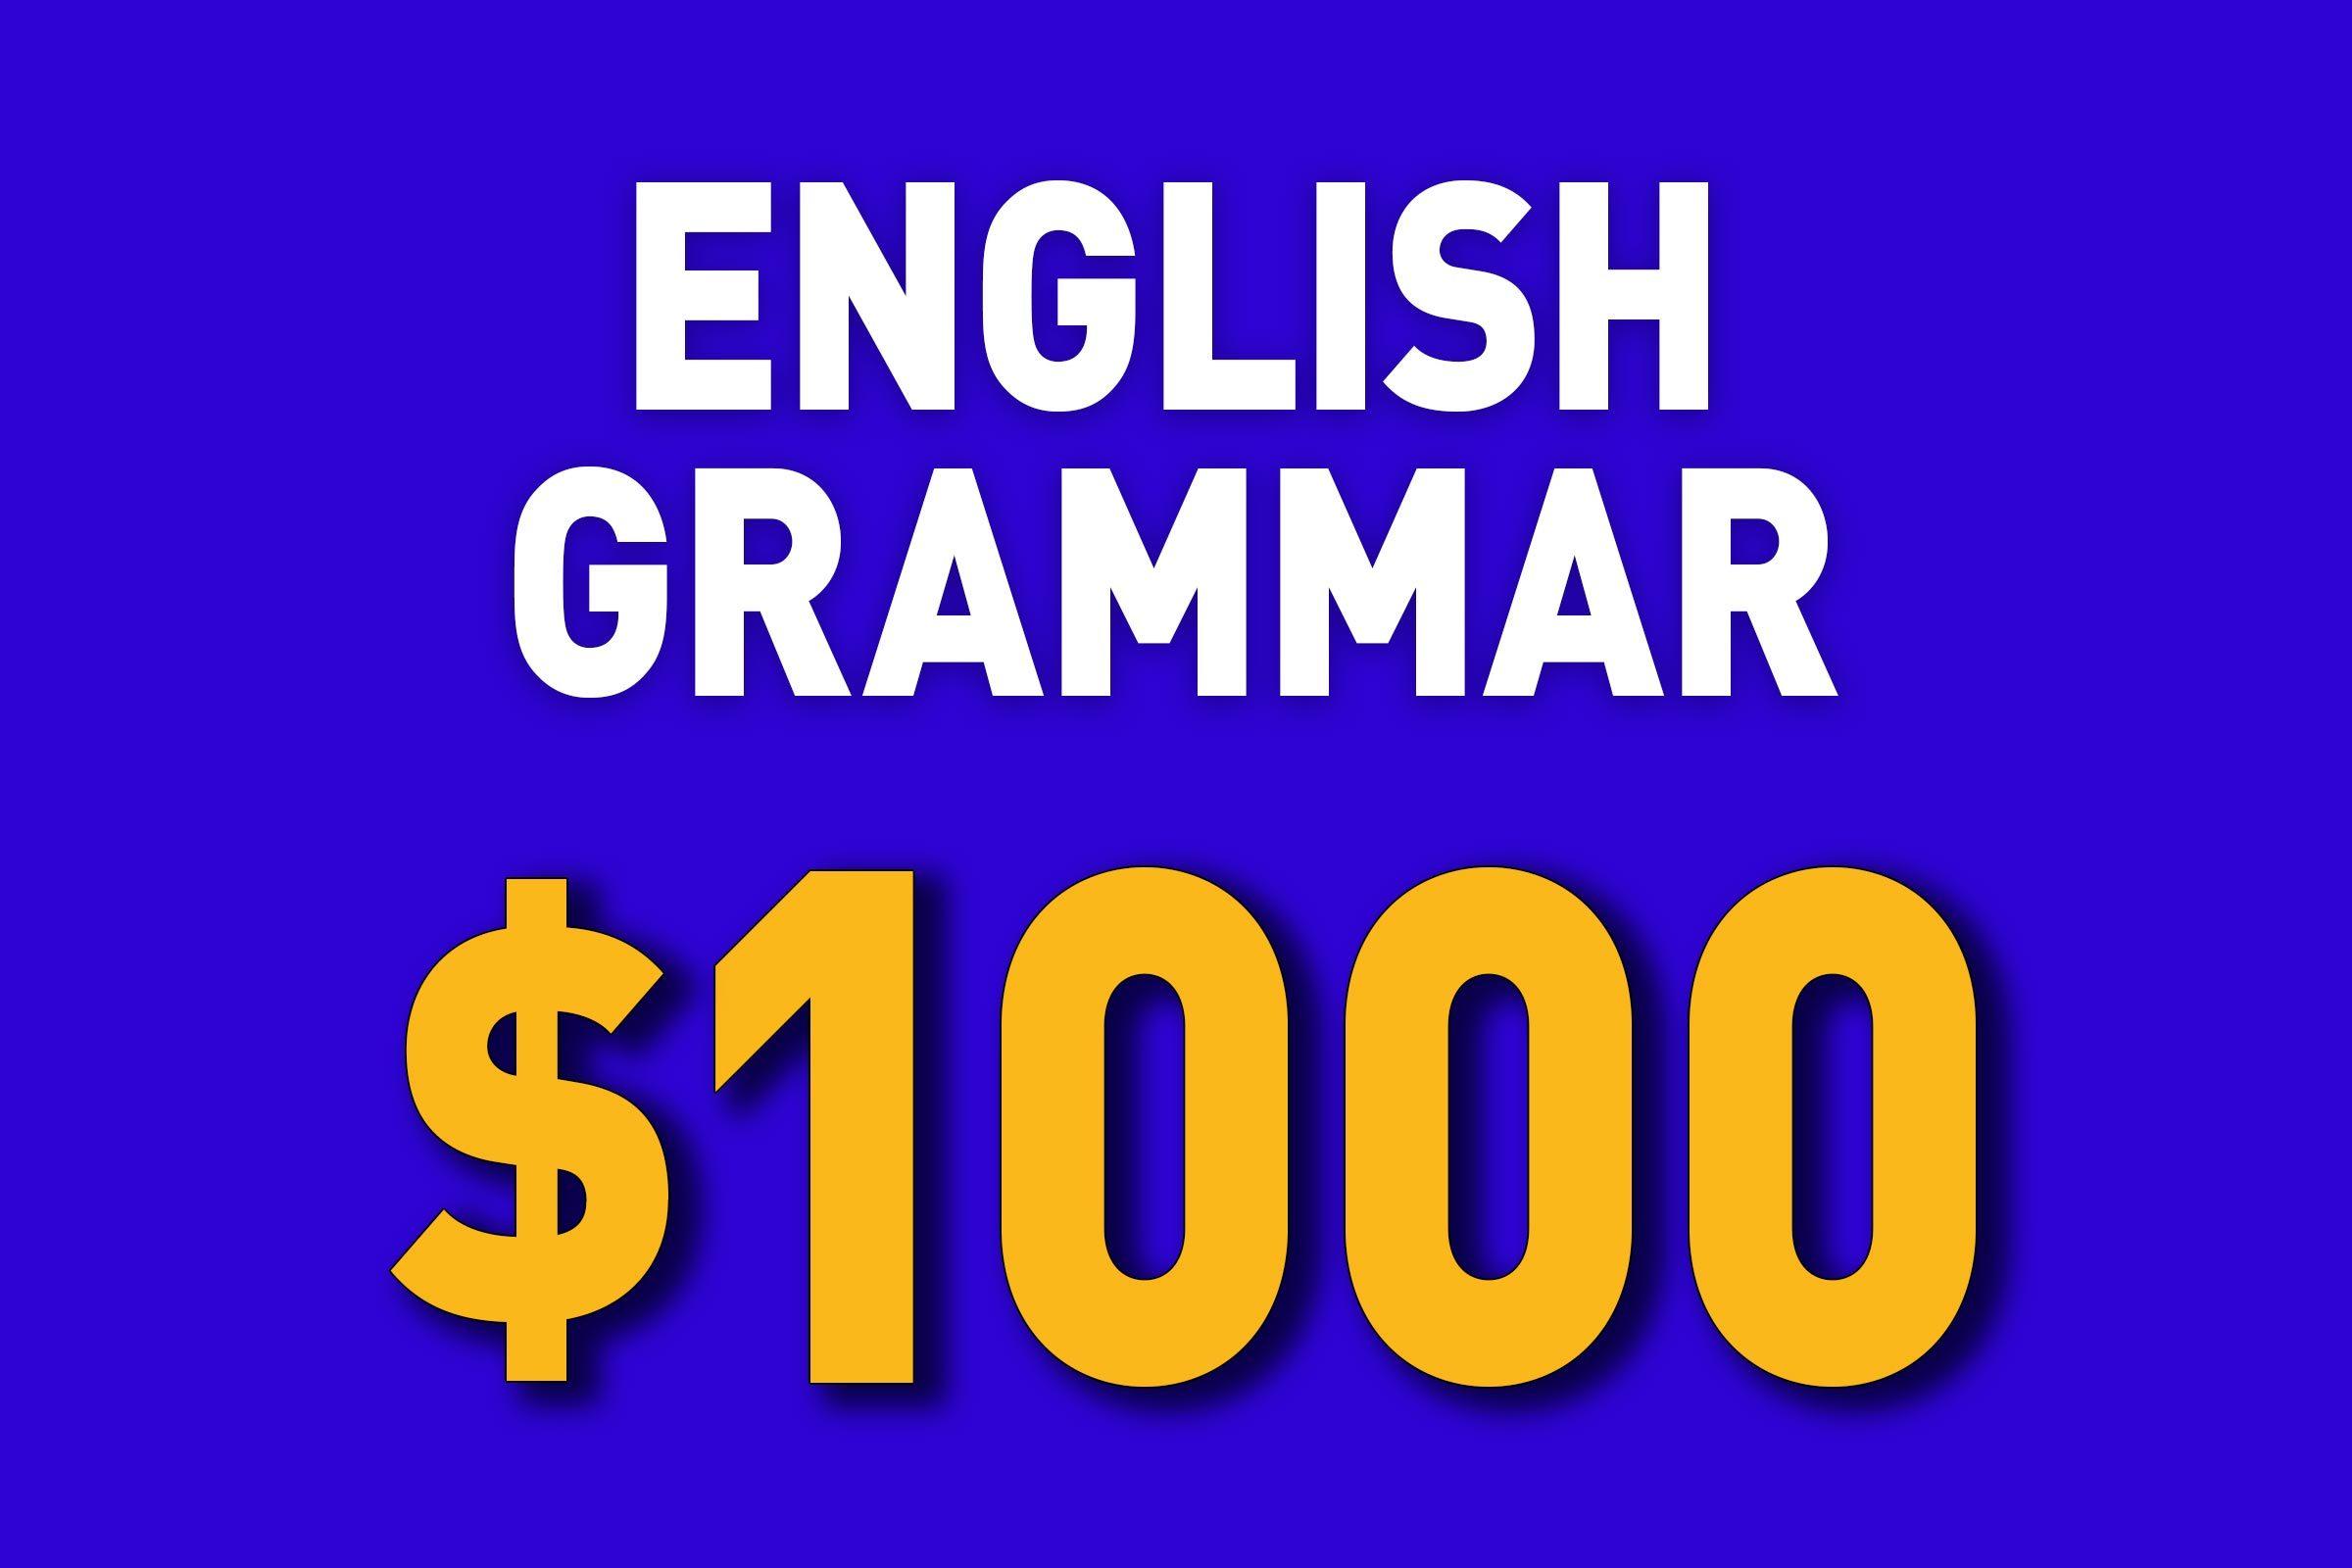 English Grammar for $1000